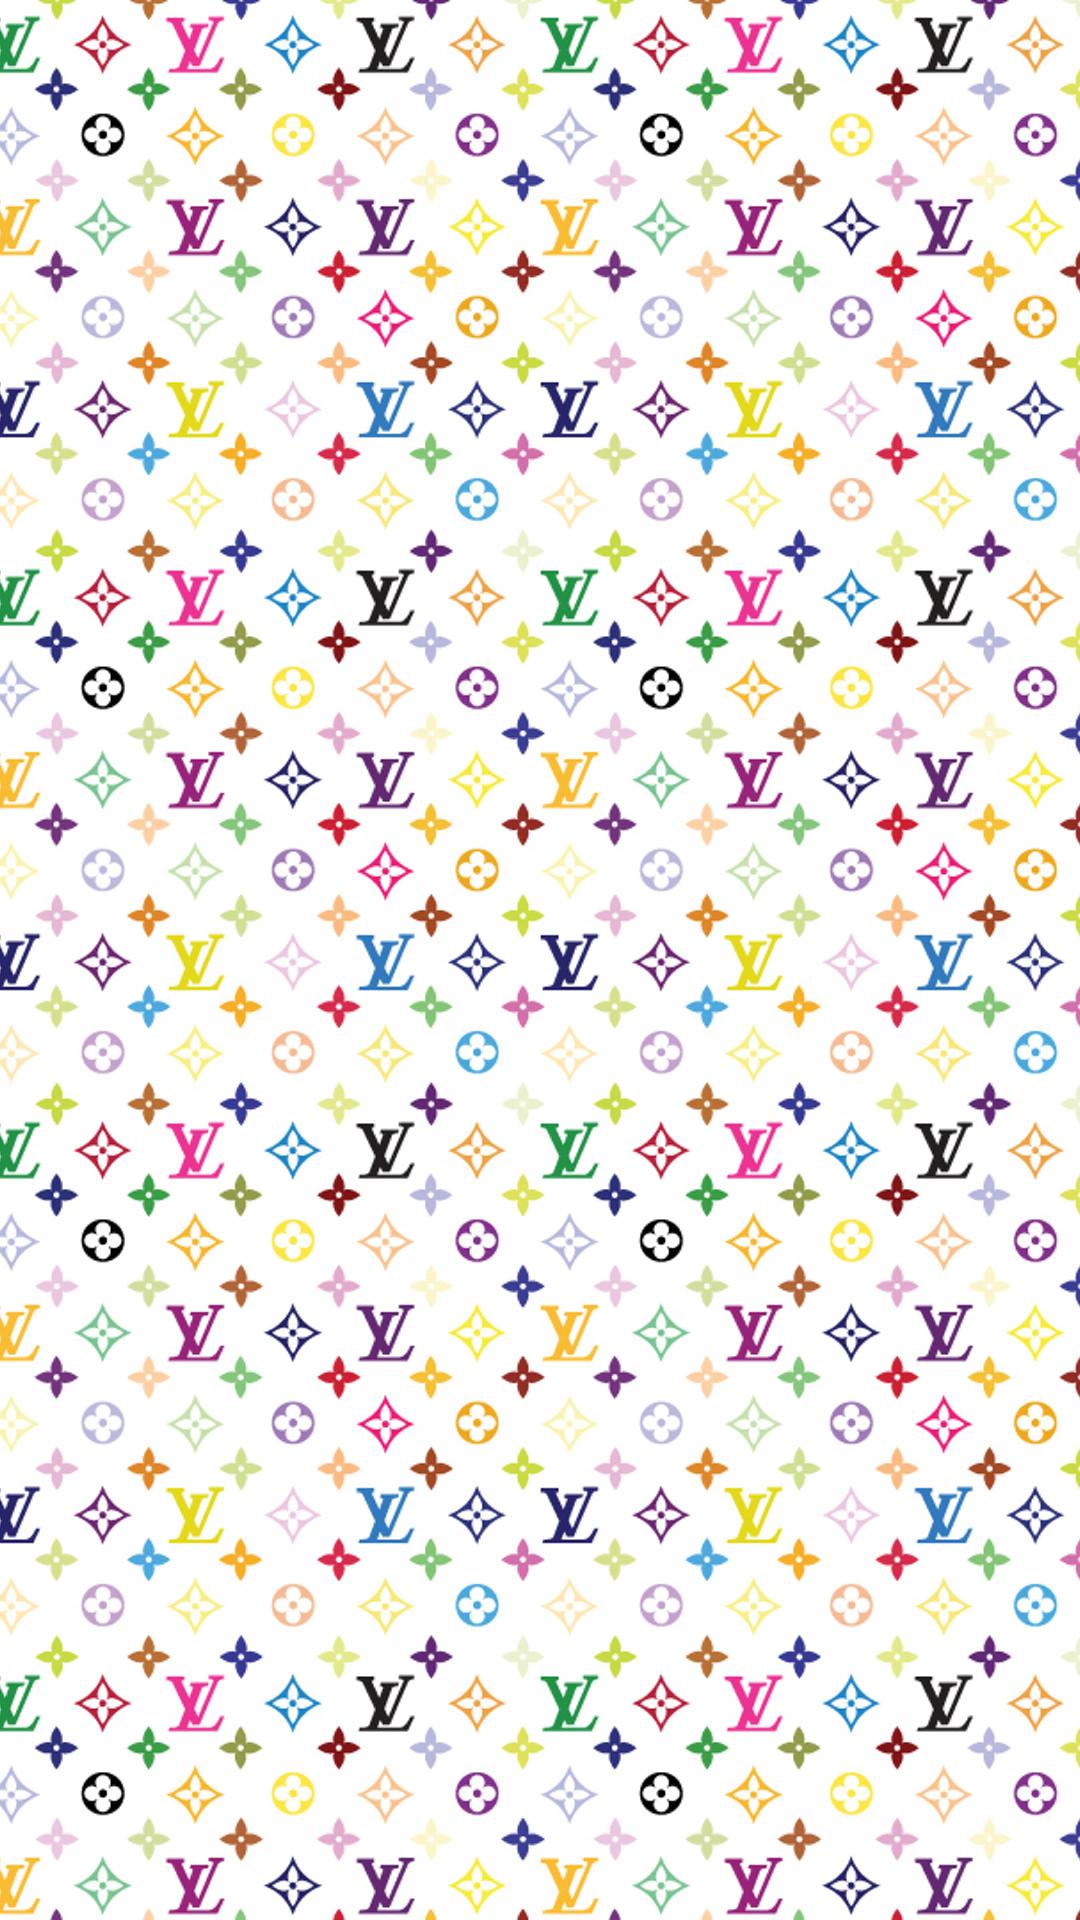 louisvuitton i11 - LOUIS VUITTON[ルイ・ヴィトン]の高画質スマホ壁紙20枚